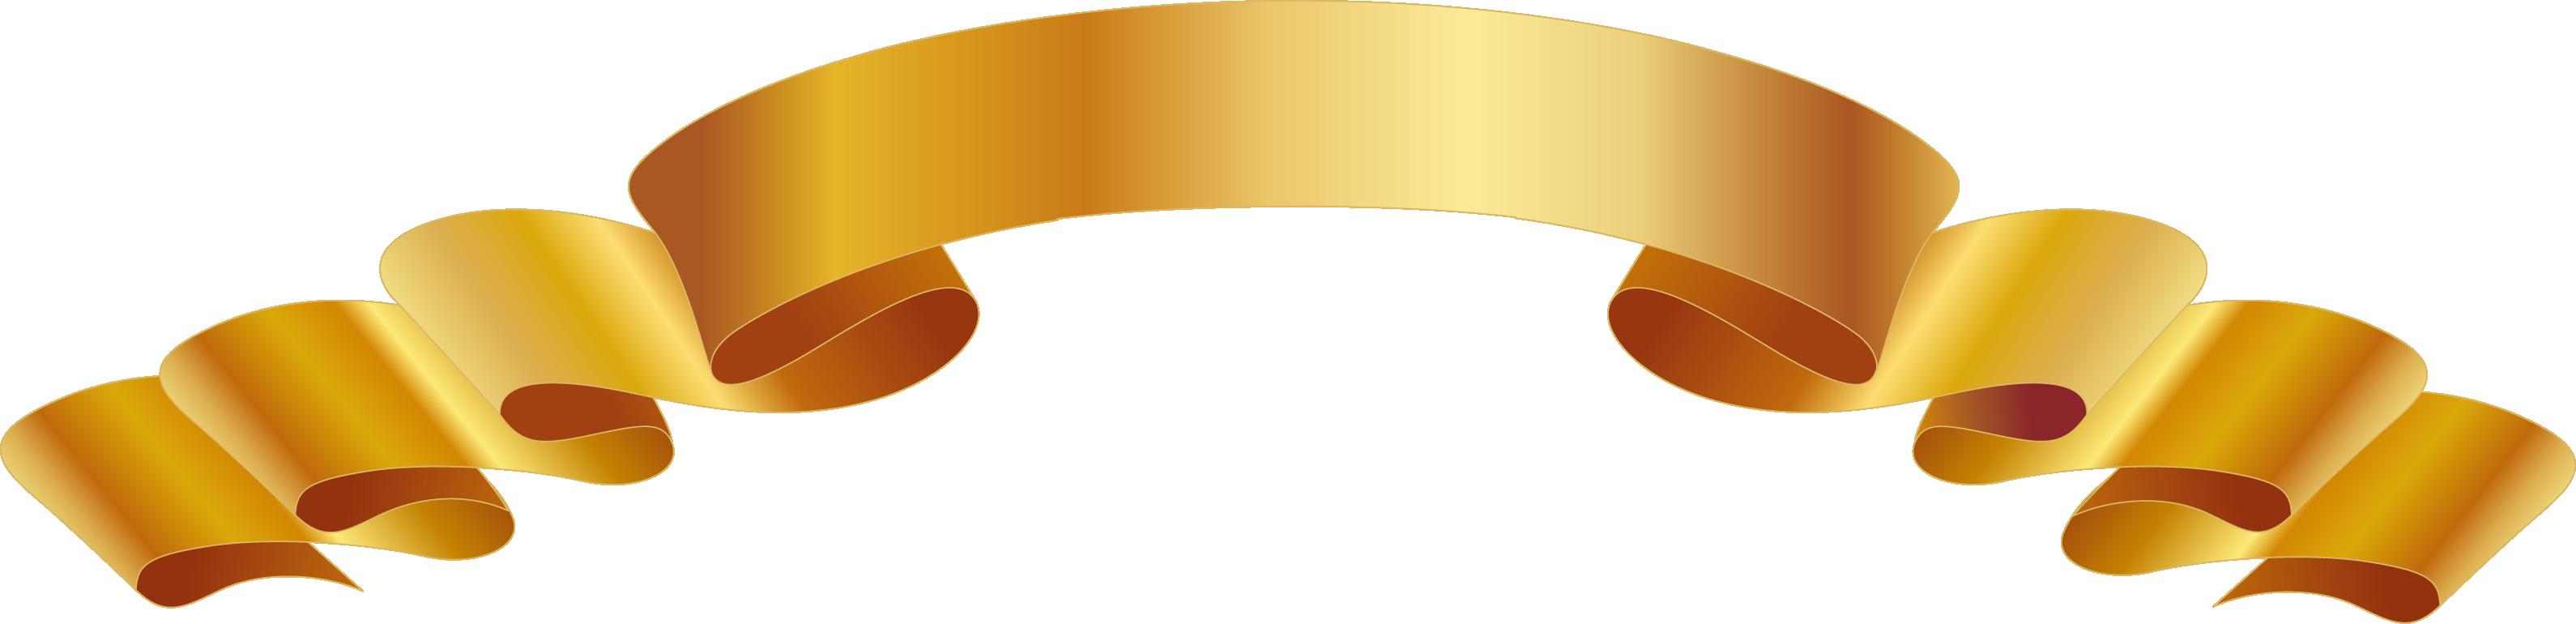 Ribbon vector png. Euclidean download gold design